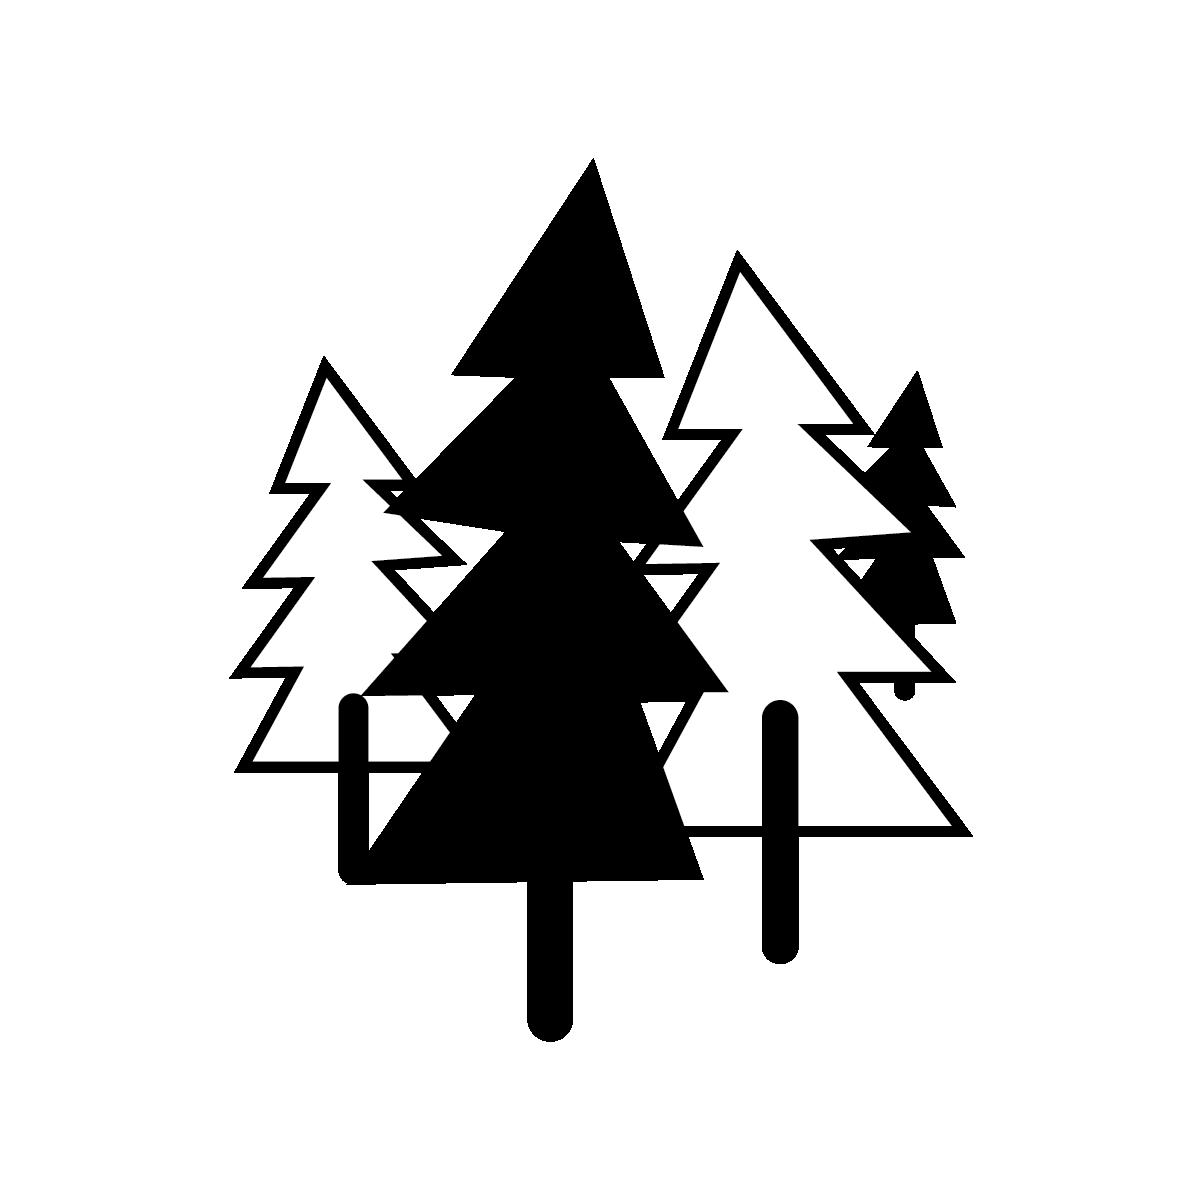 cc-logo_25.png